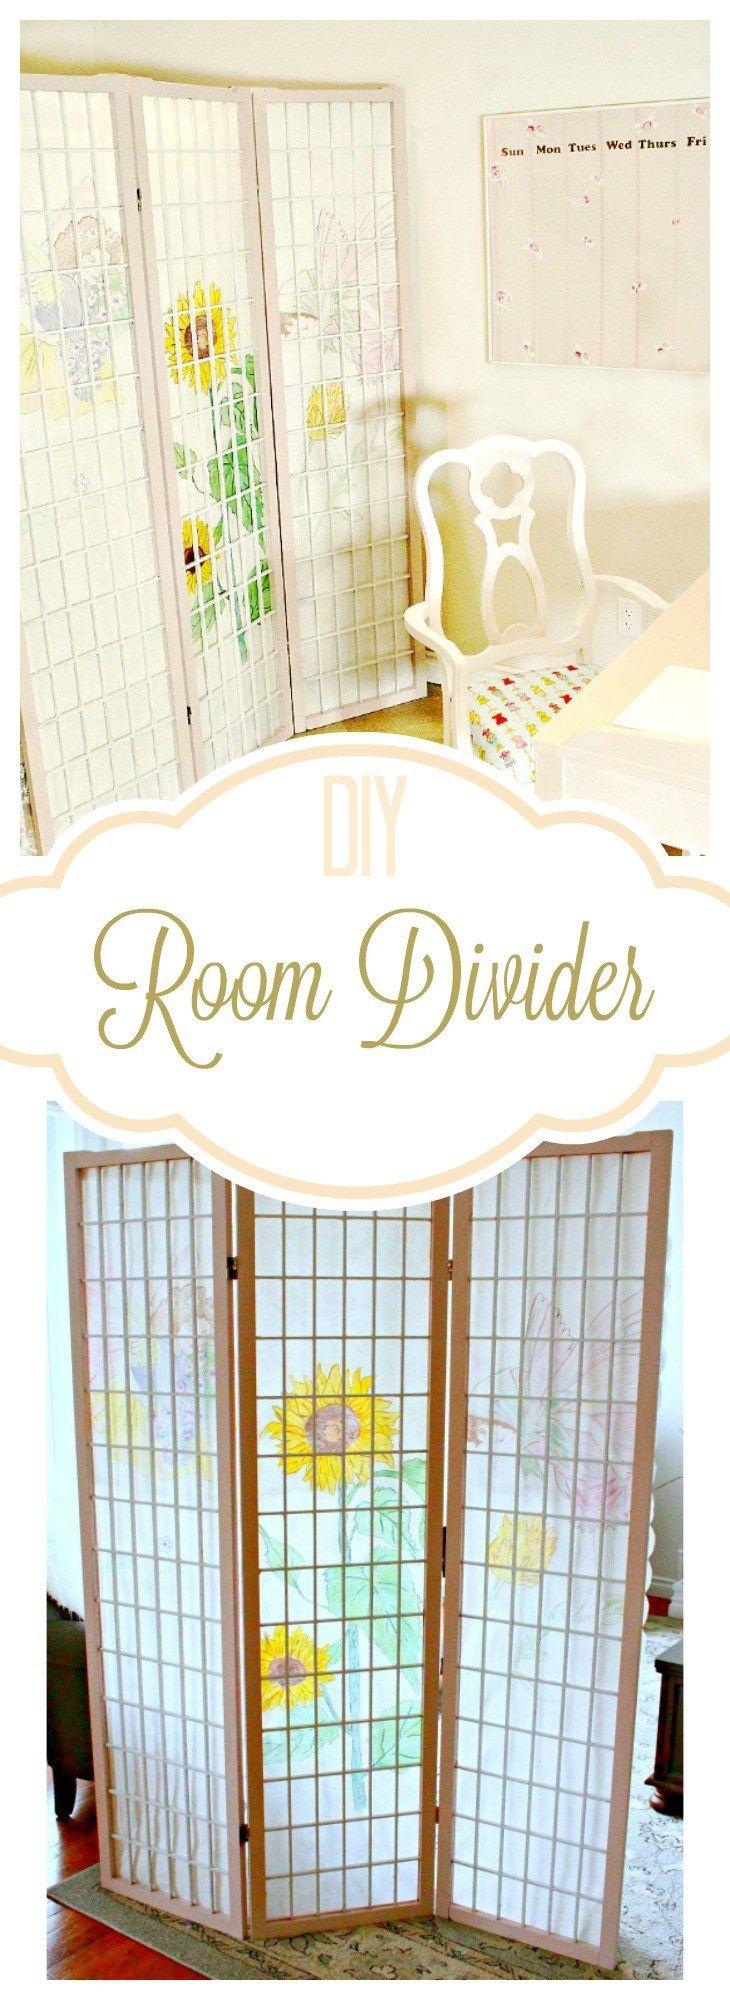 Room dividers, Room screens, diy room divider, cheap room divider, room divider ideas, room dividers diy, screen room dividers